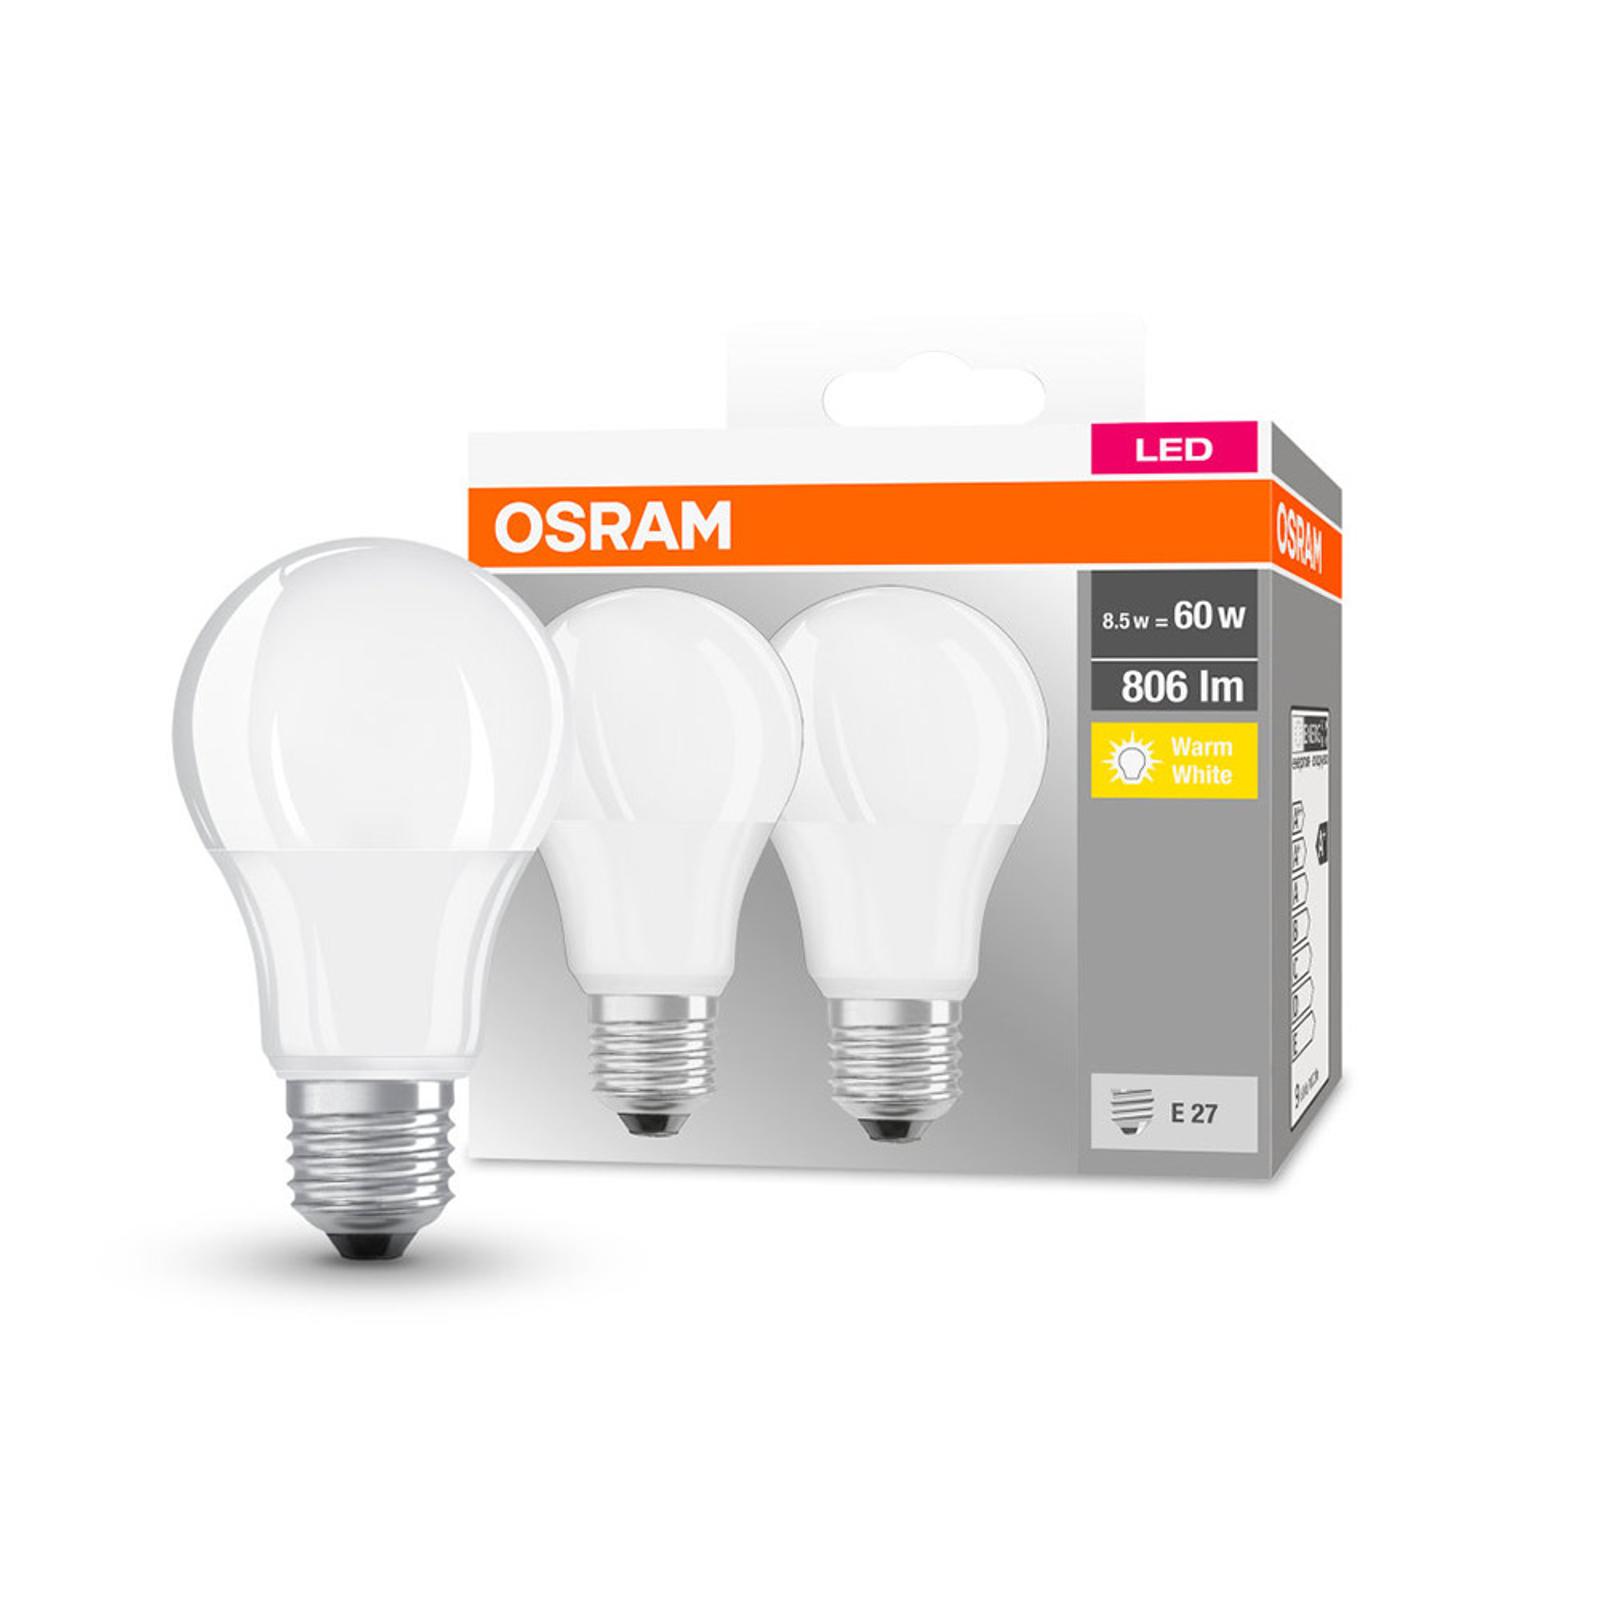 OSRAM LED-Lampe Classic E27 8,5W 2.700K 806lm 2er